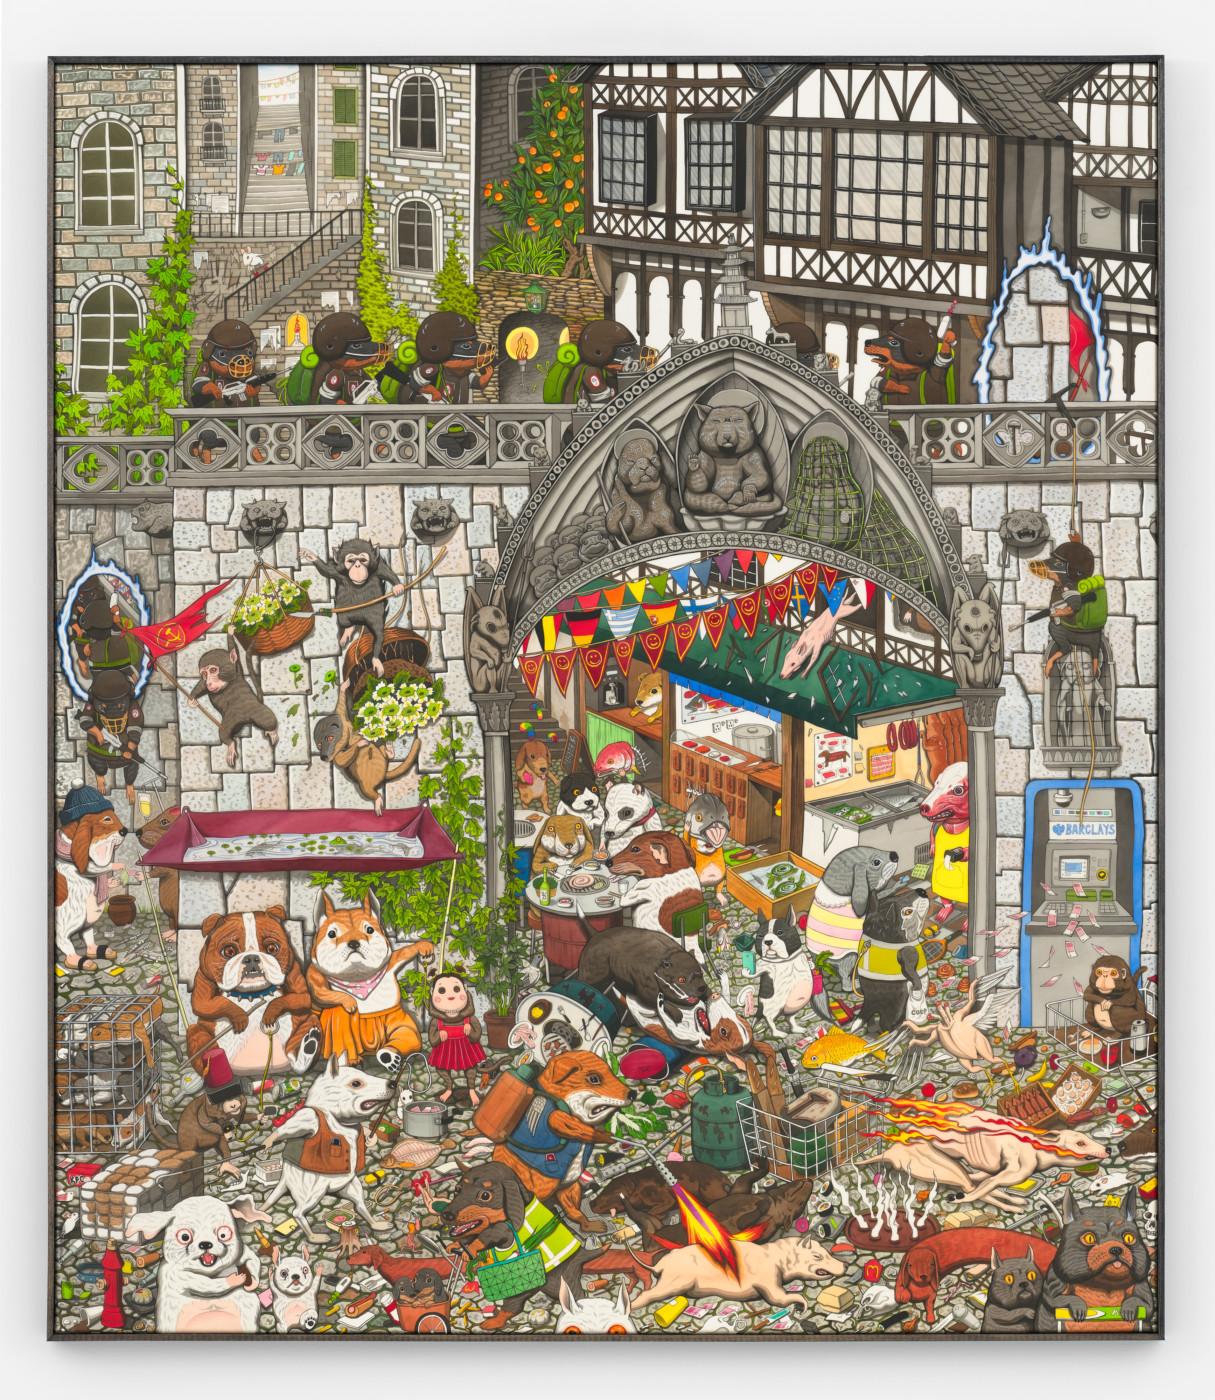 PURE WAR  Doggy Market , 2019 Pigment on silk 115 x 100 x 2.5 cm / 45.3 x 39.4 x 1 in - High Art Gallery Paris